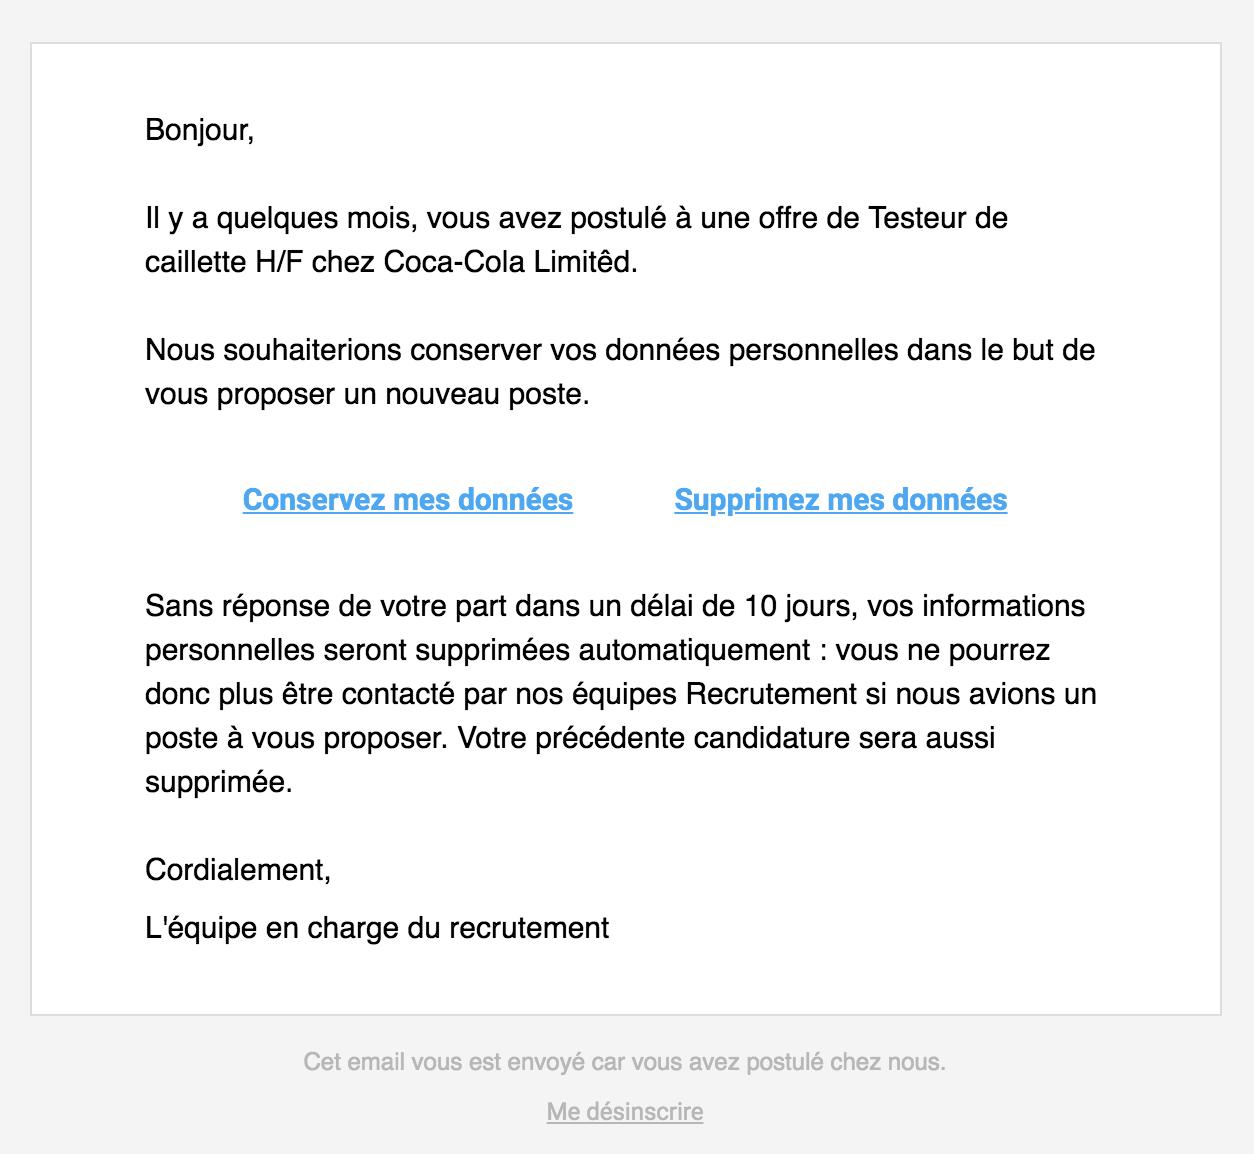 renouveler_consentement_donnees